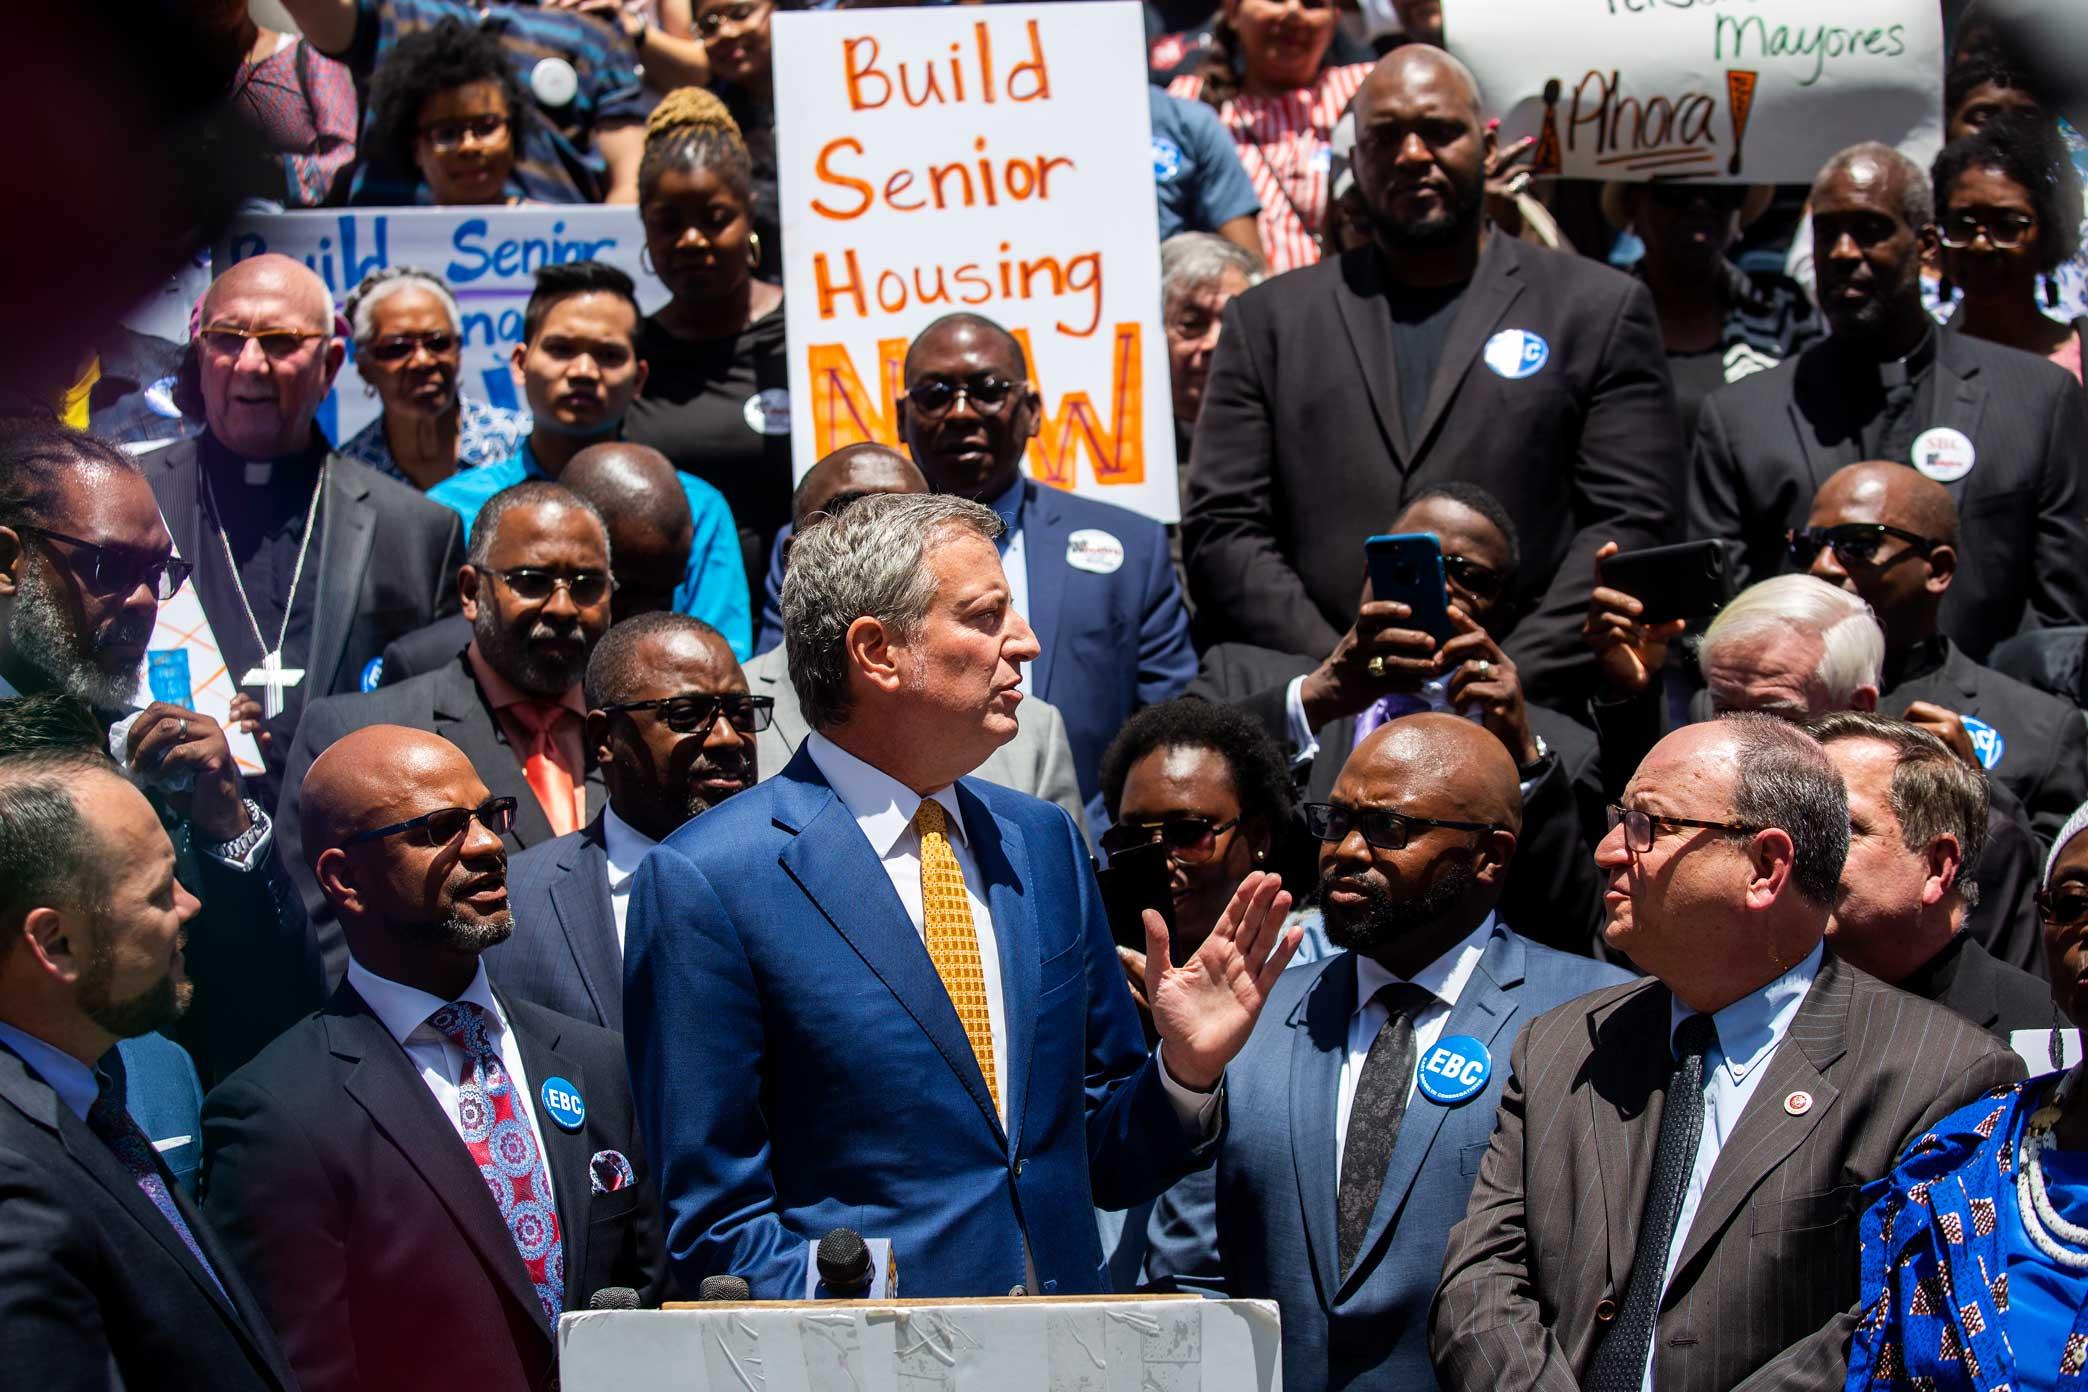 New York City Mayor Bill DeBlasio speak to Community members during a rally at New York's City Hall about senior housing and NYCHA repairs.